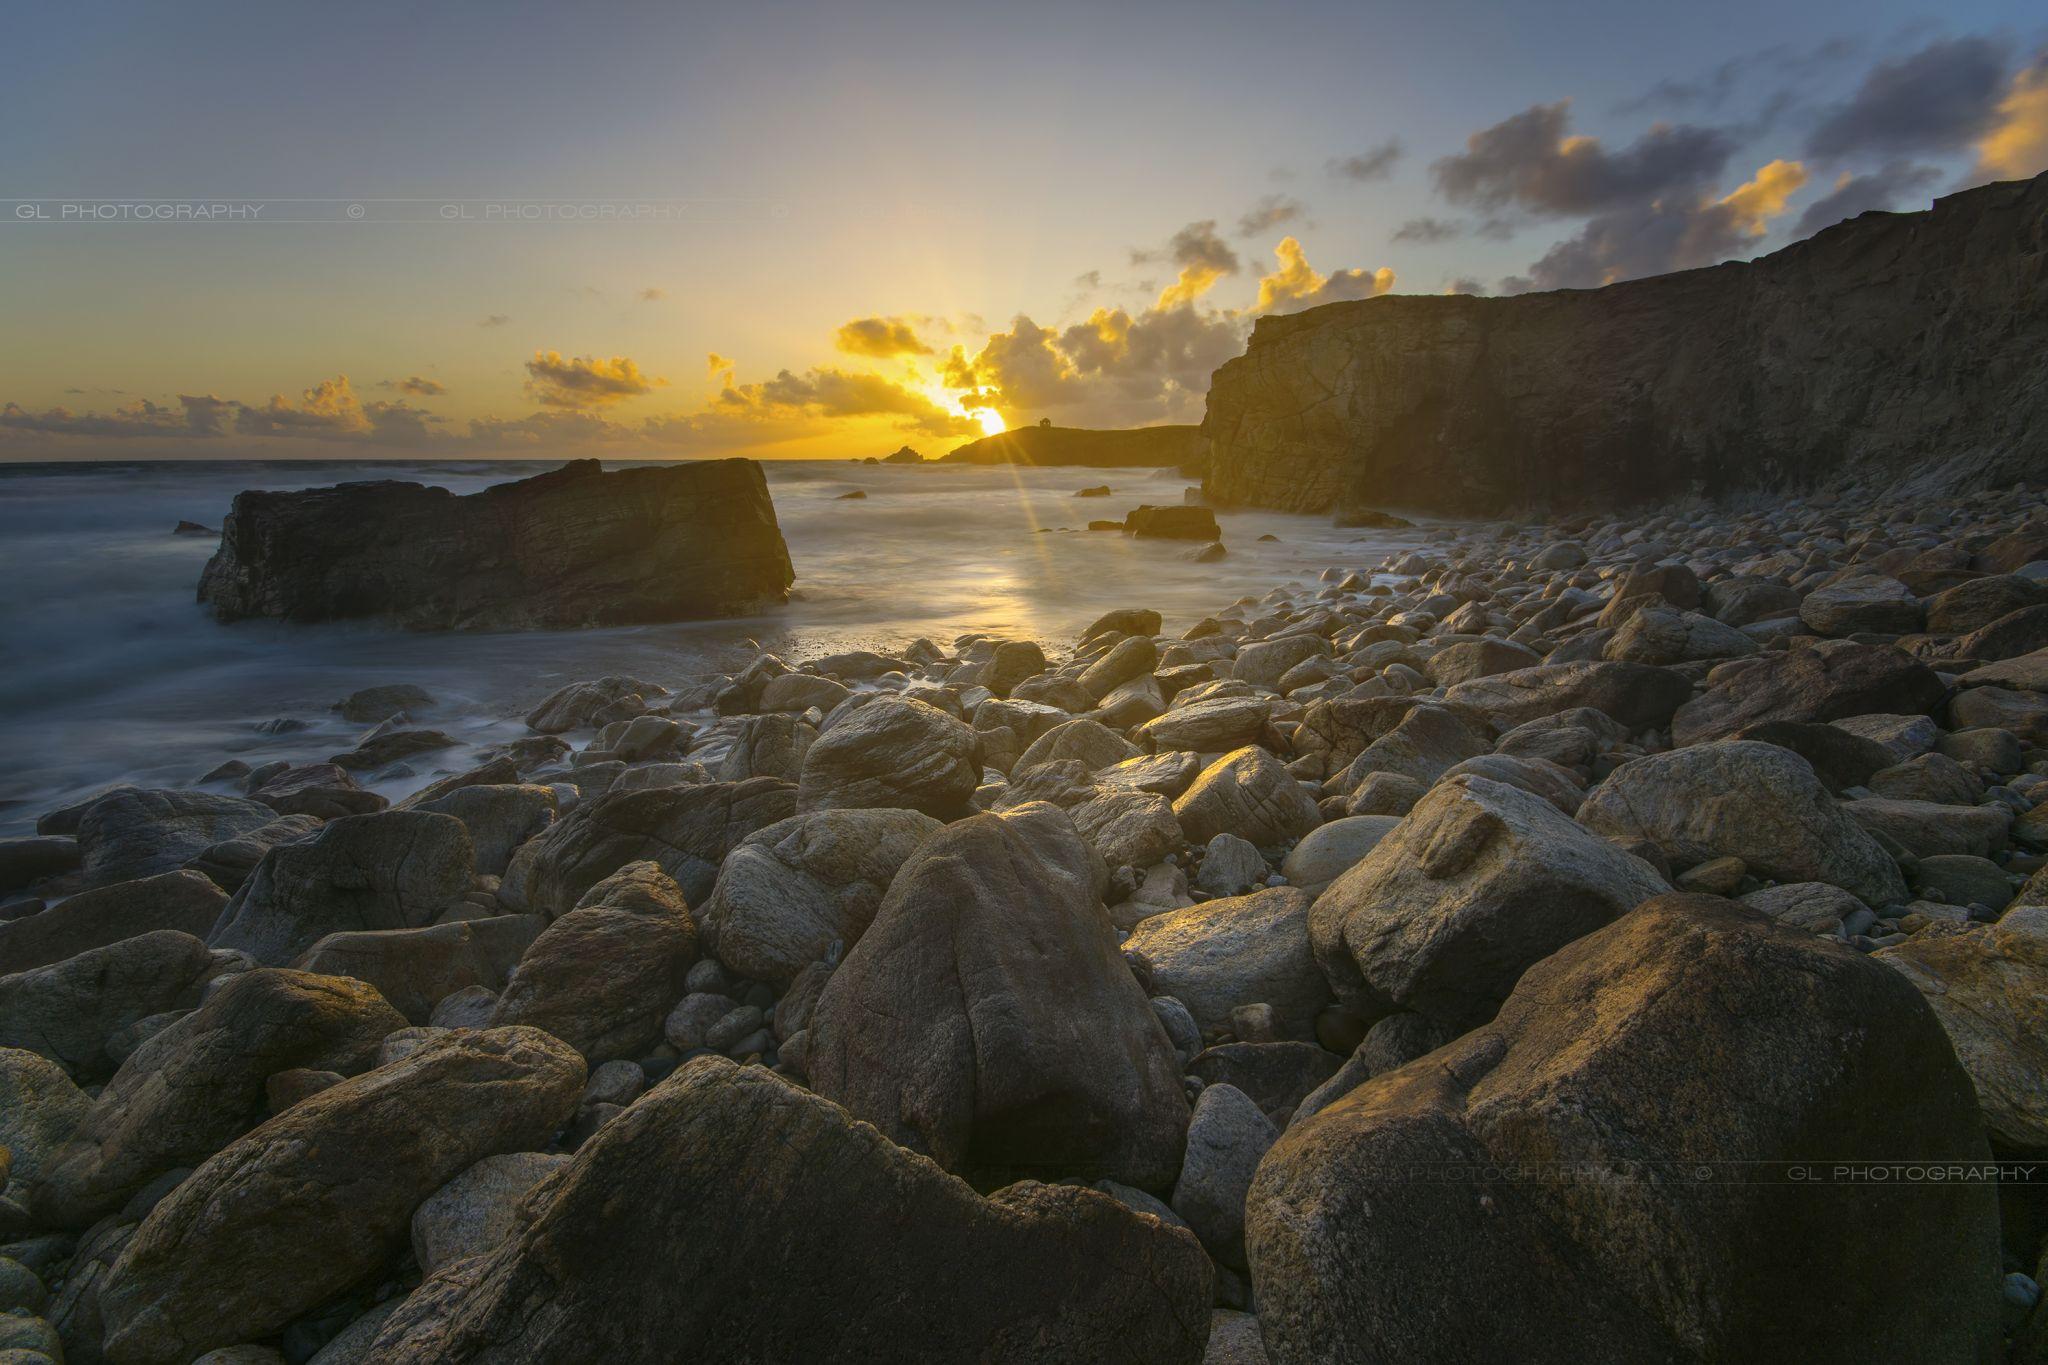 Quiberon wild coast, France